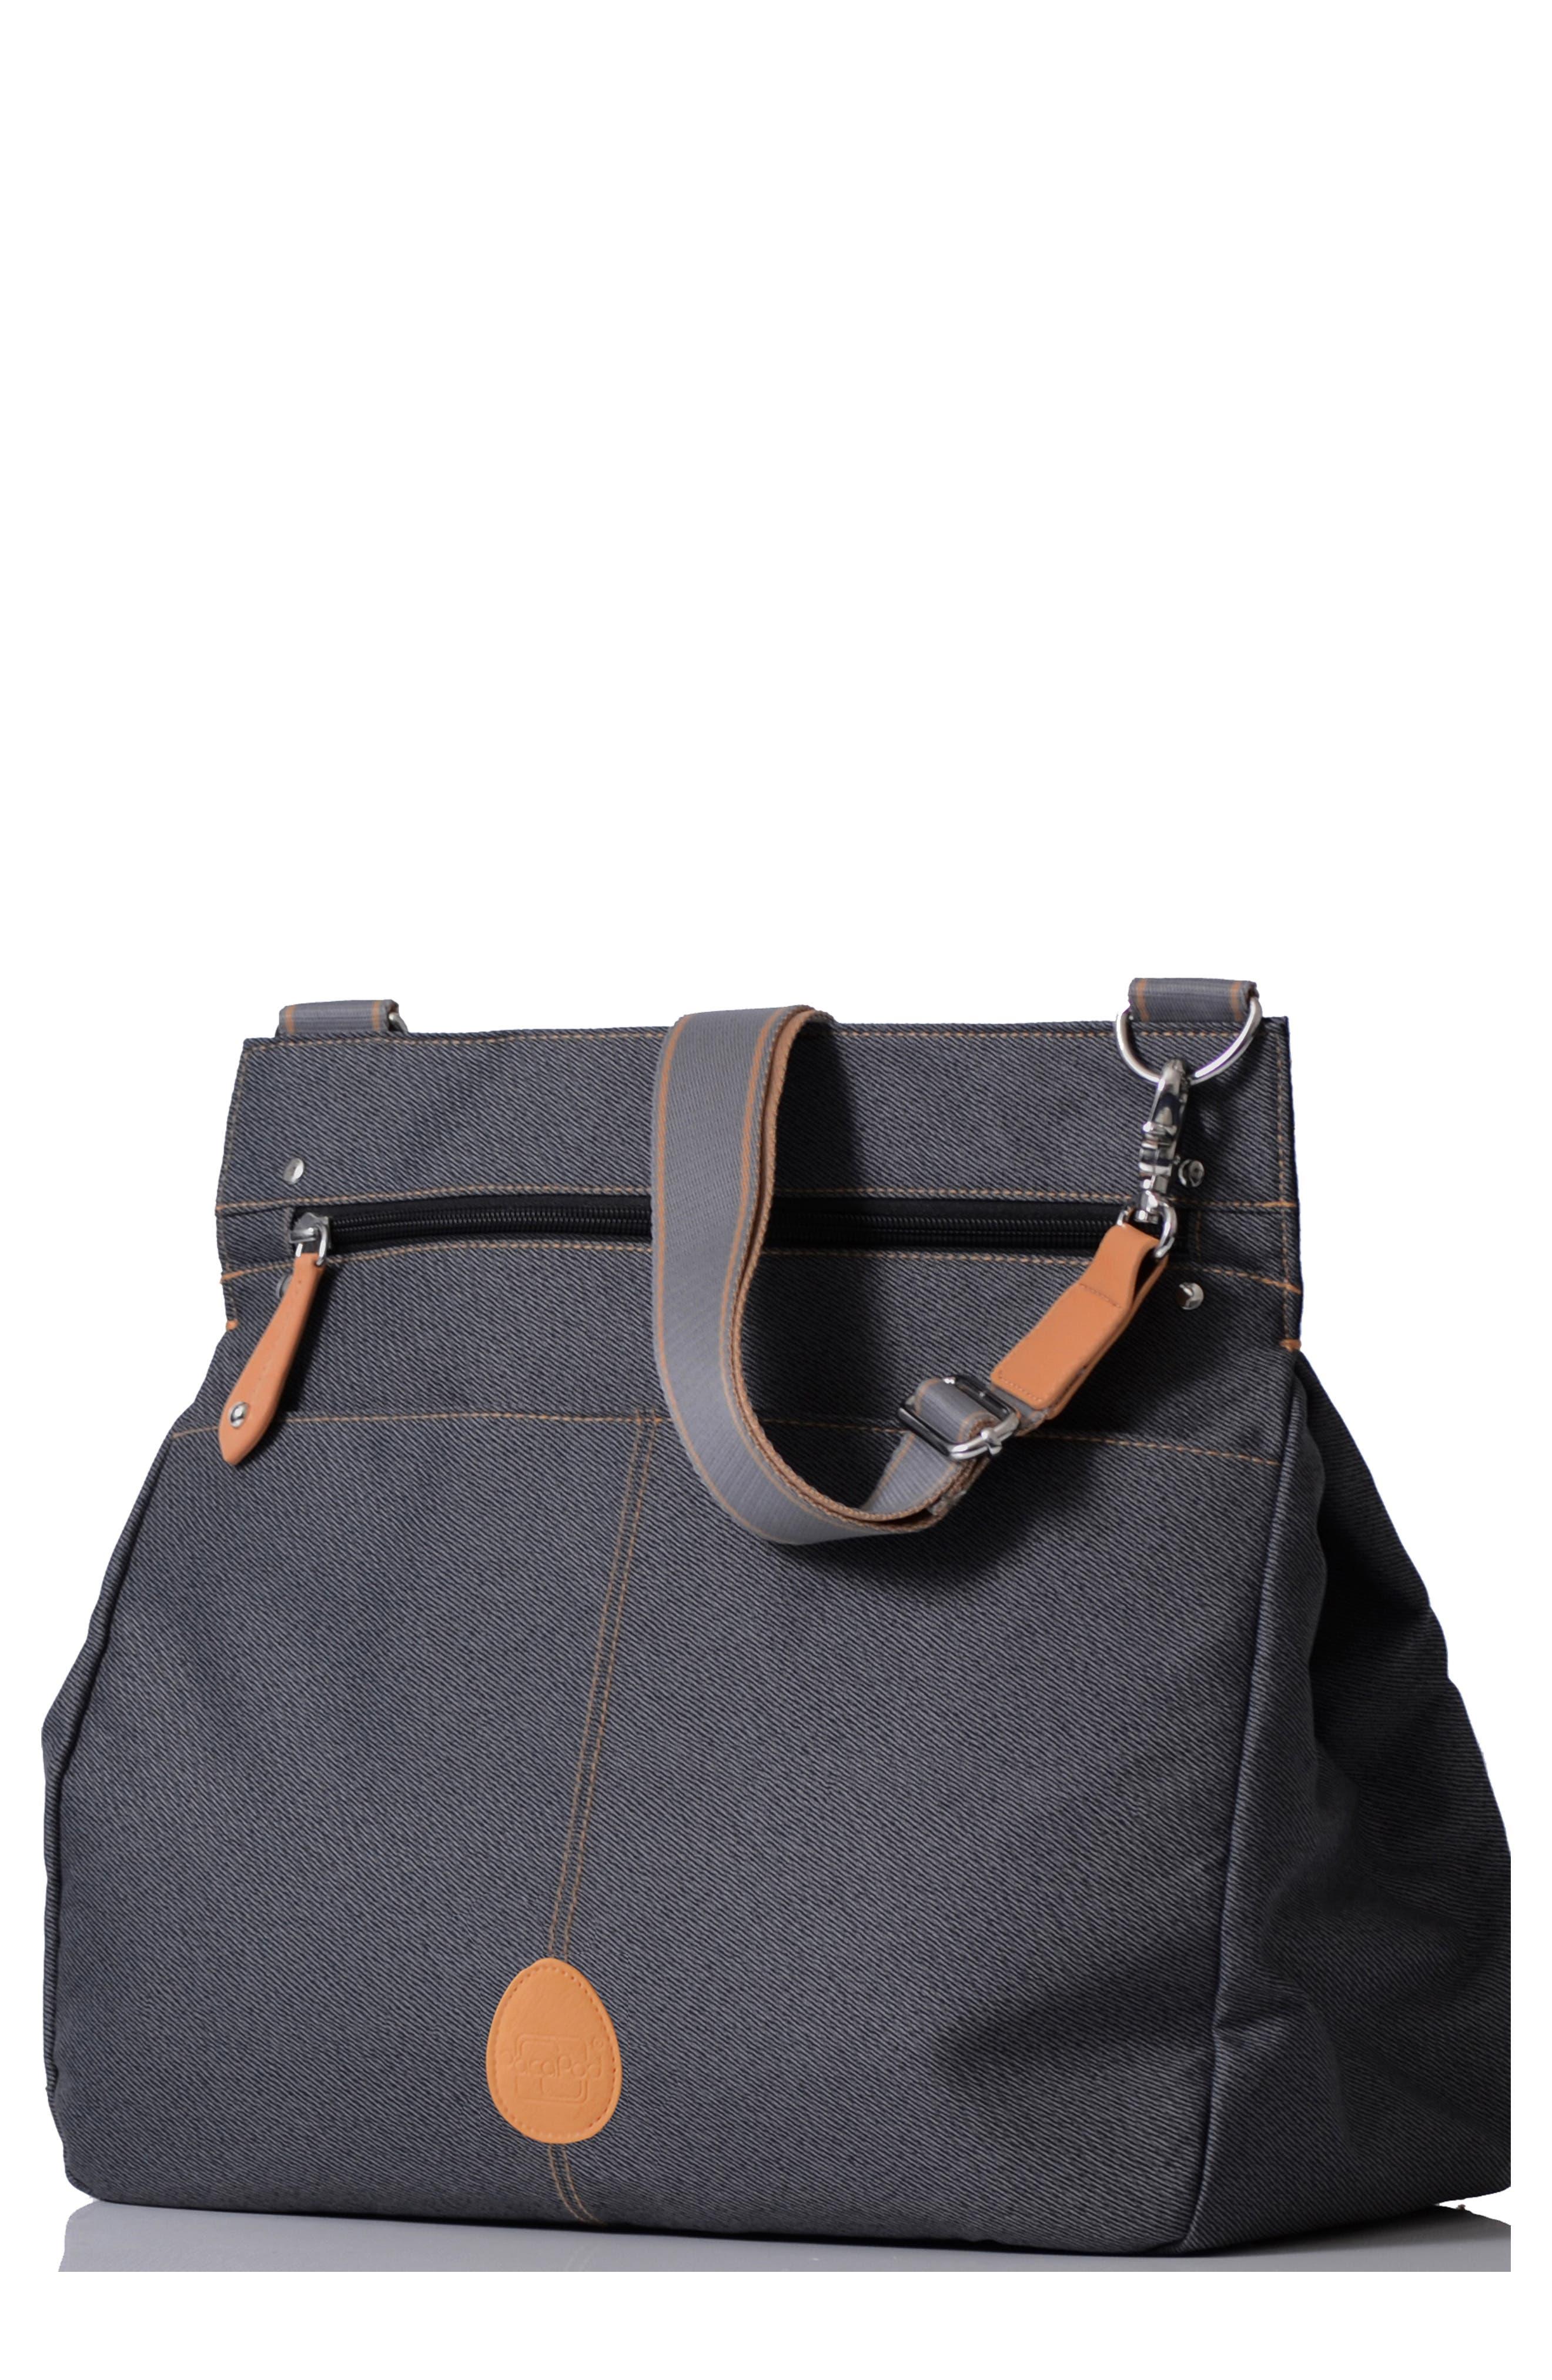 'Oban' Diaper Bag,                         Main,                         color, BLACK CHARCOAL